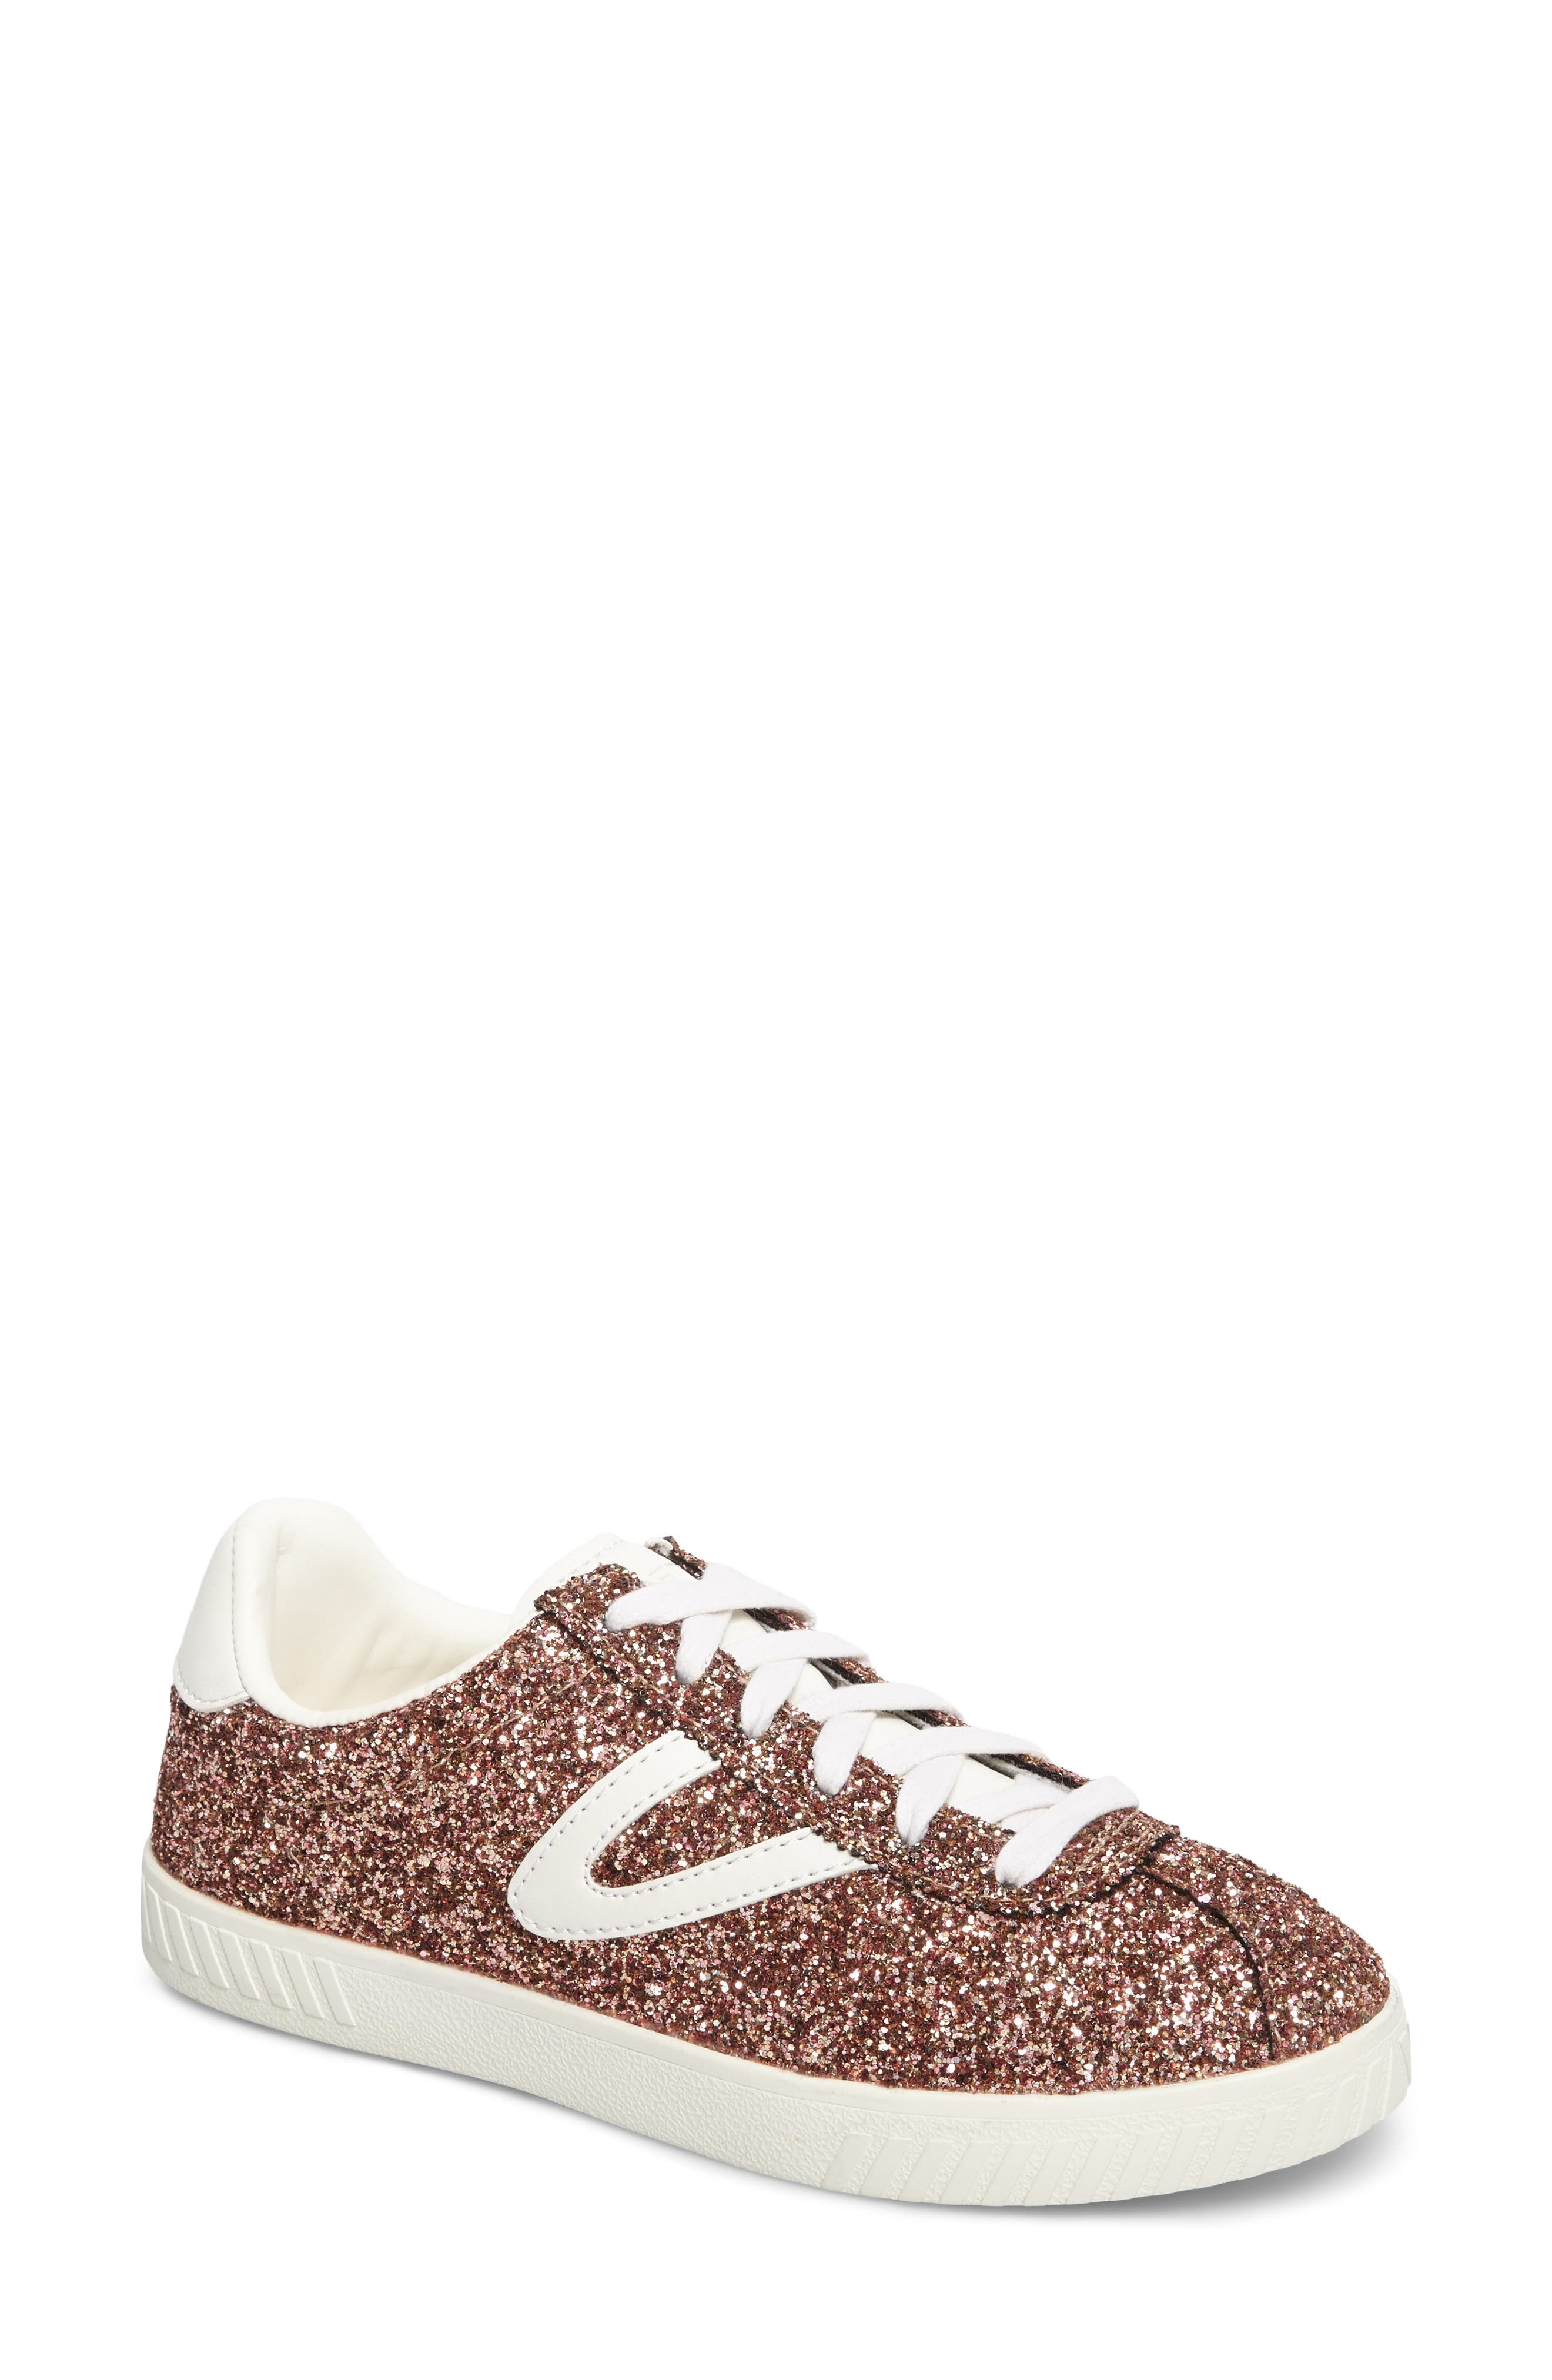 Tretorn Camden 5 Sneaker (Women)